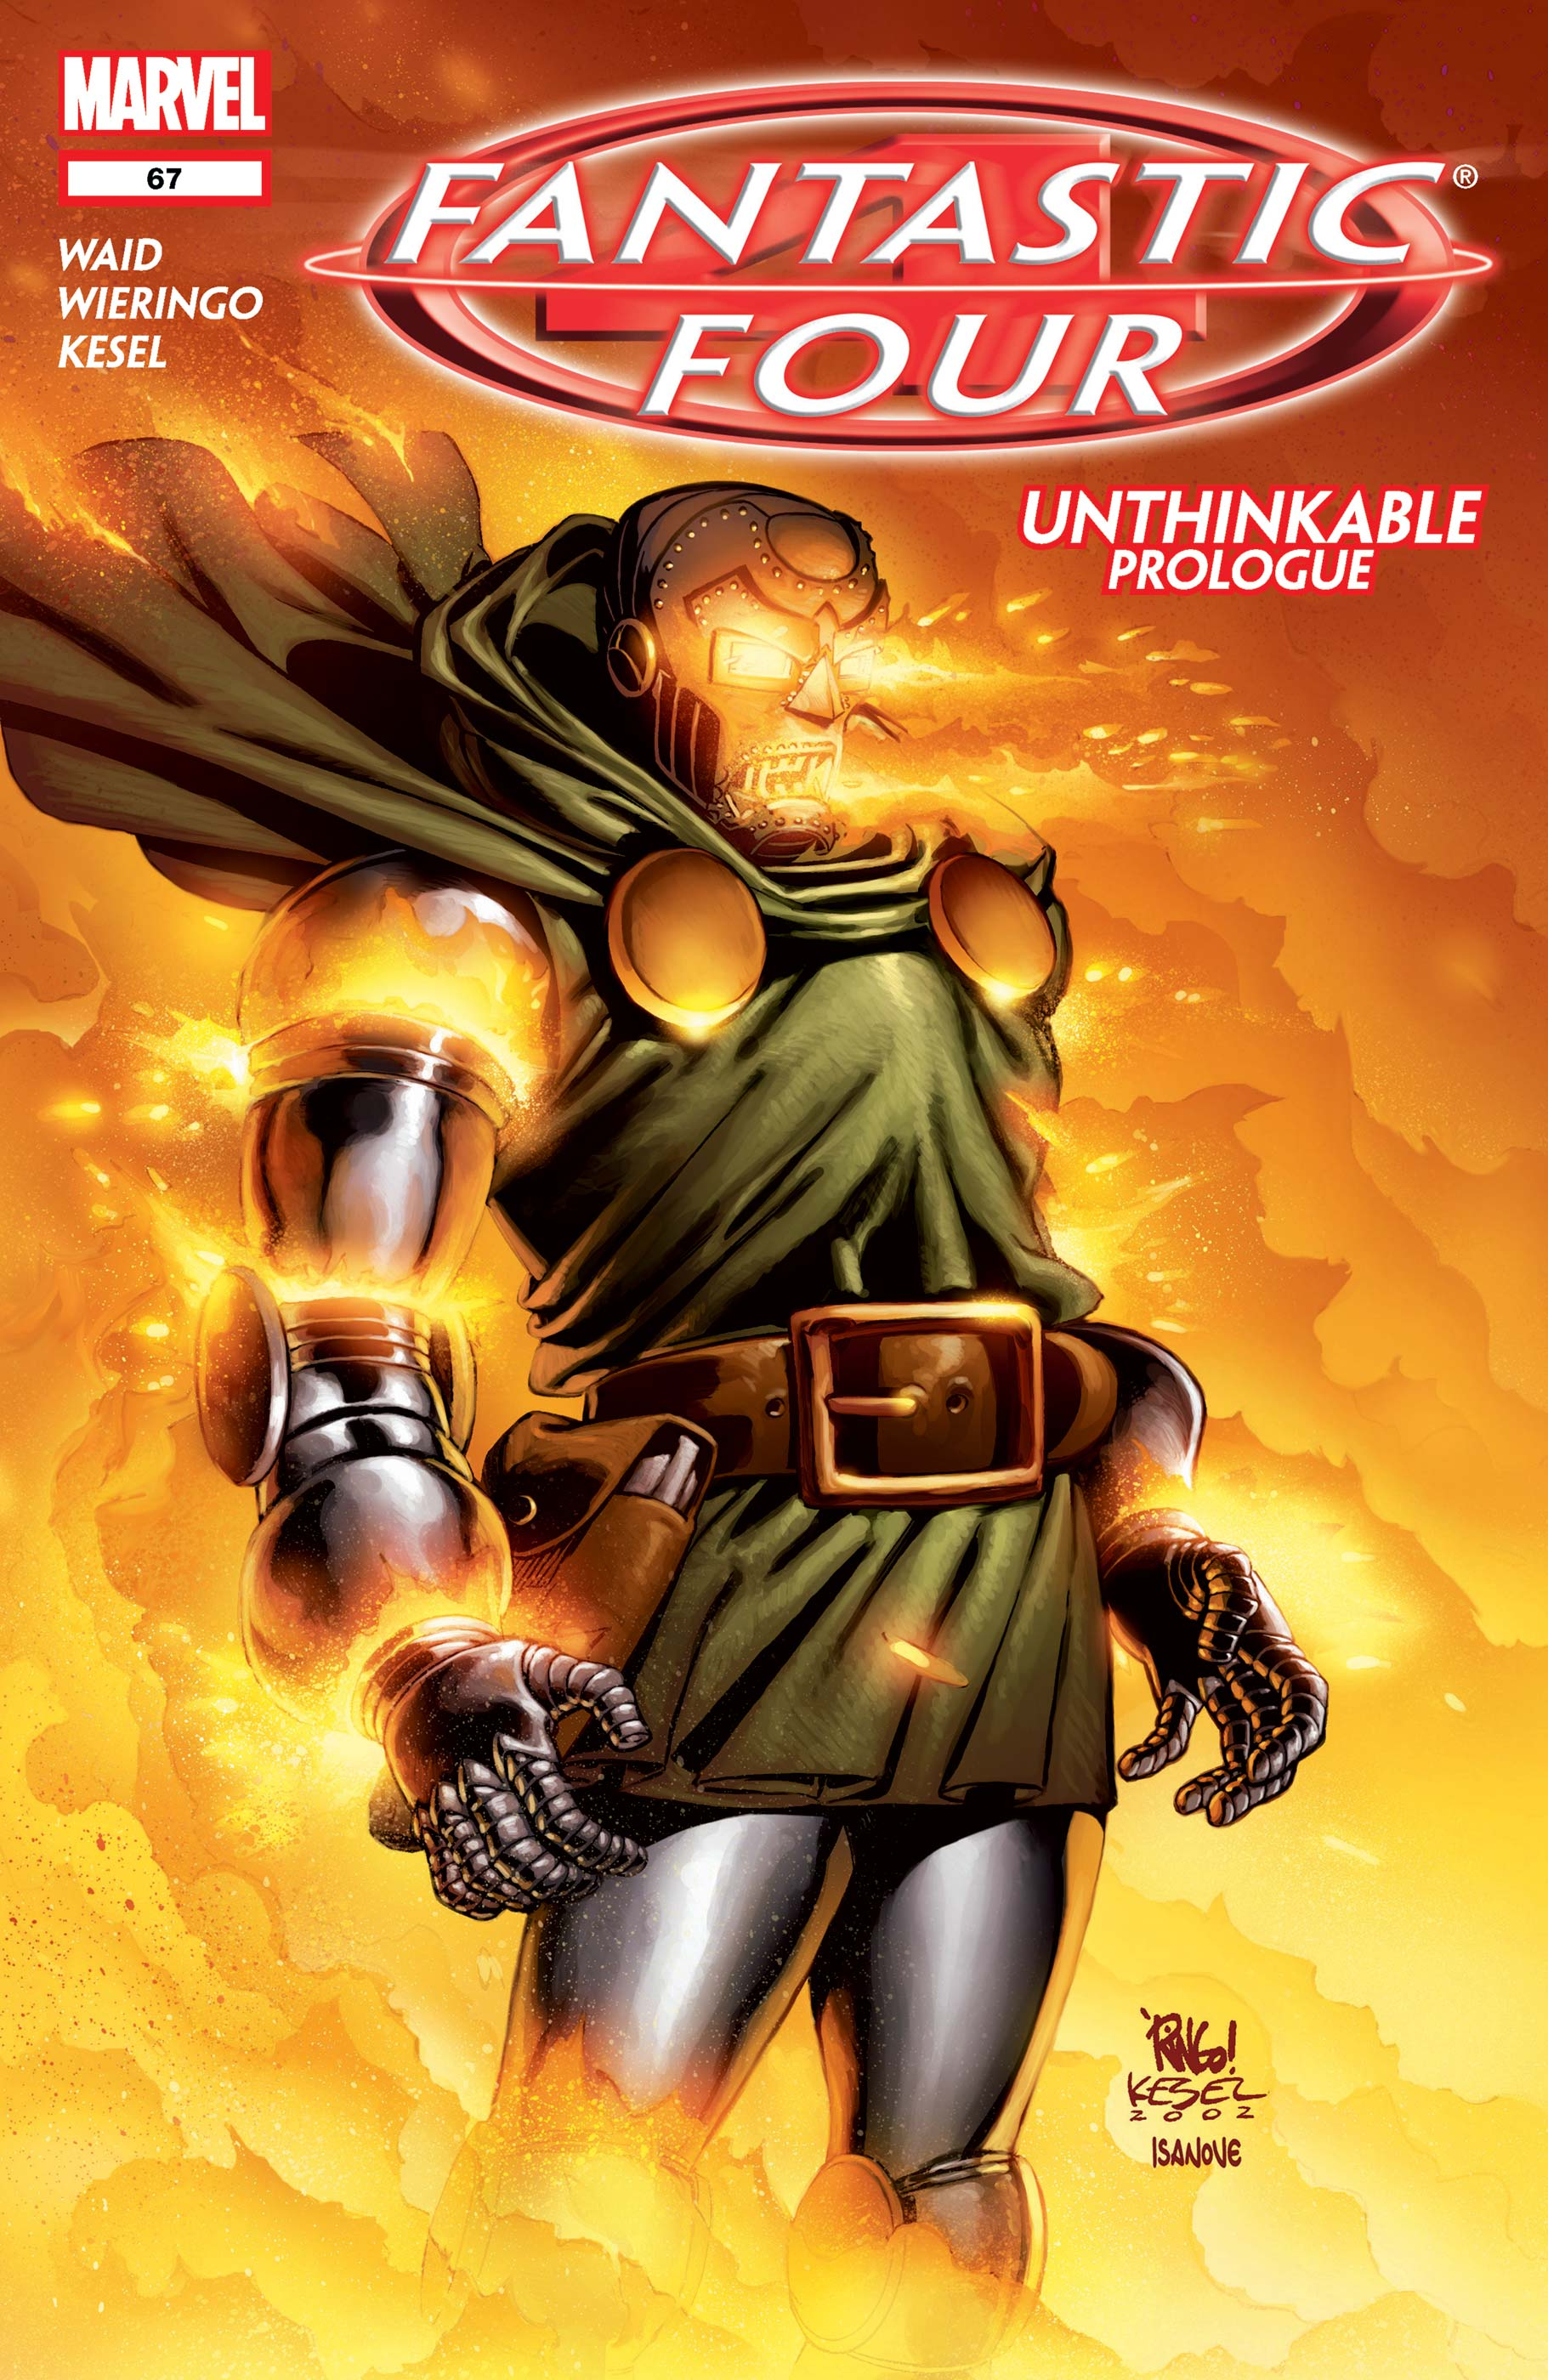 Fantastic Four (1998) #67